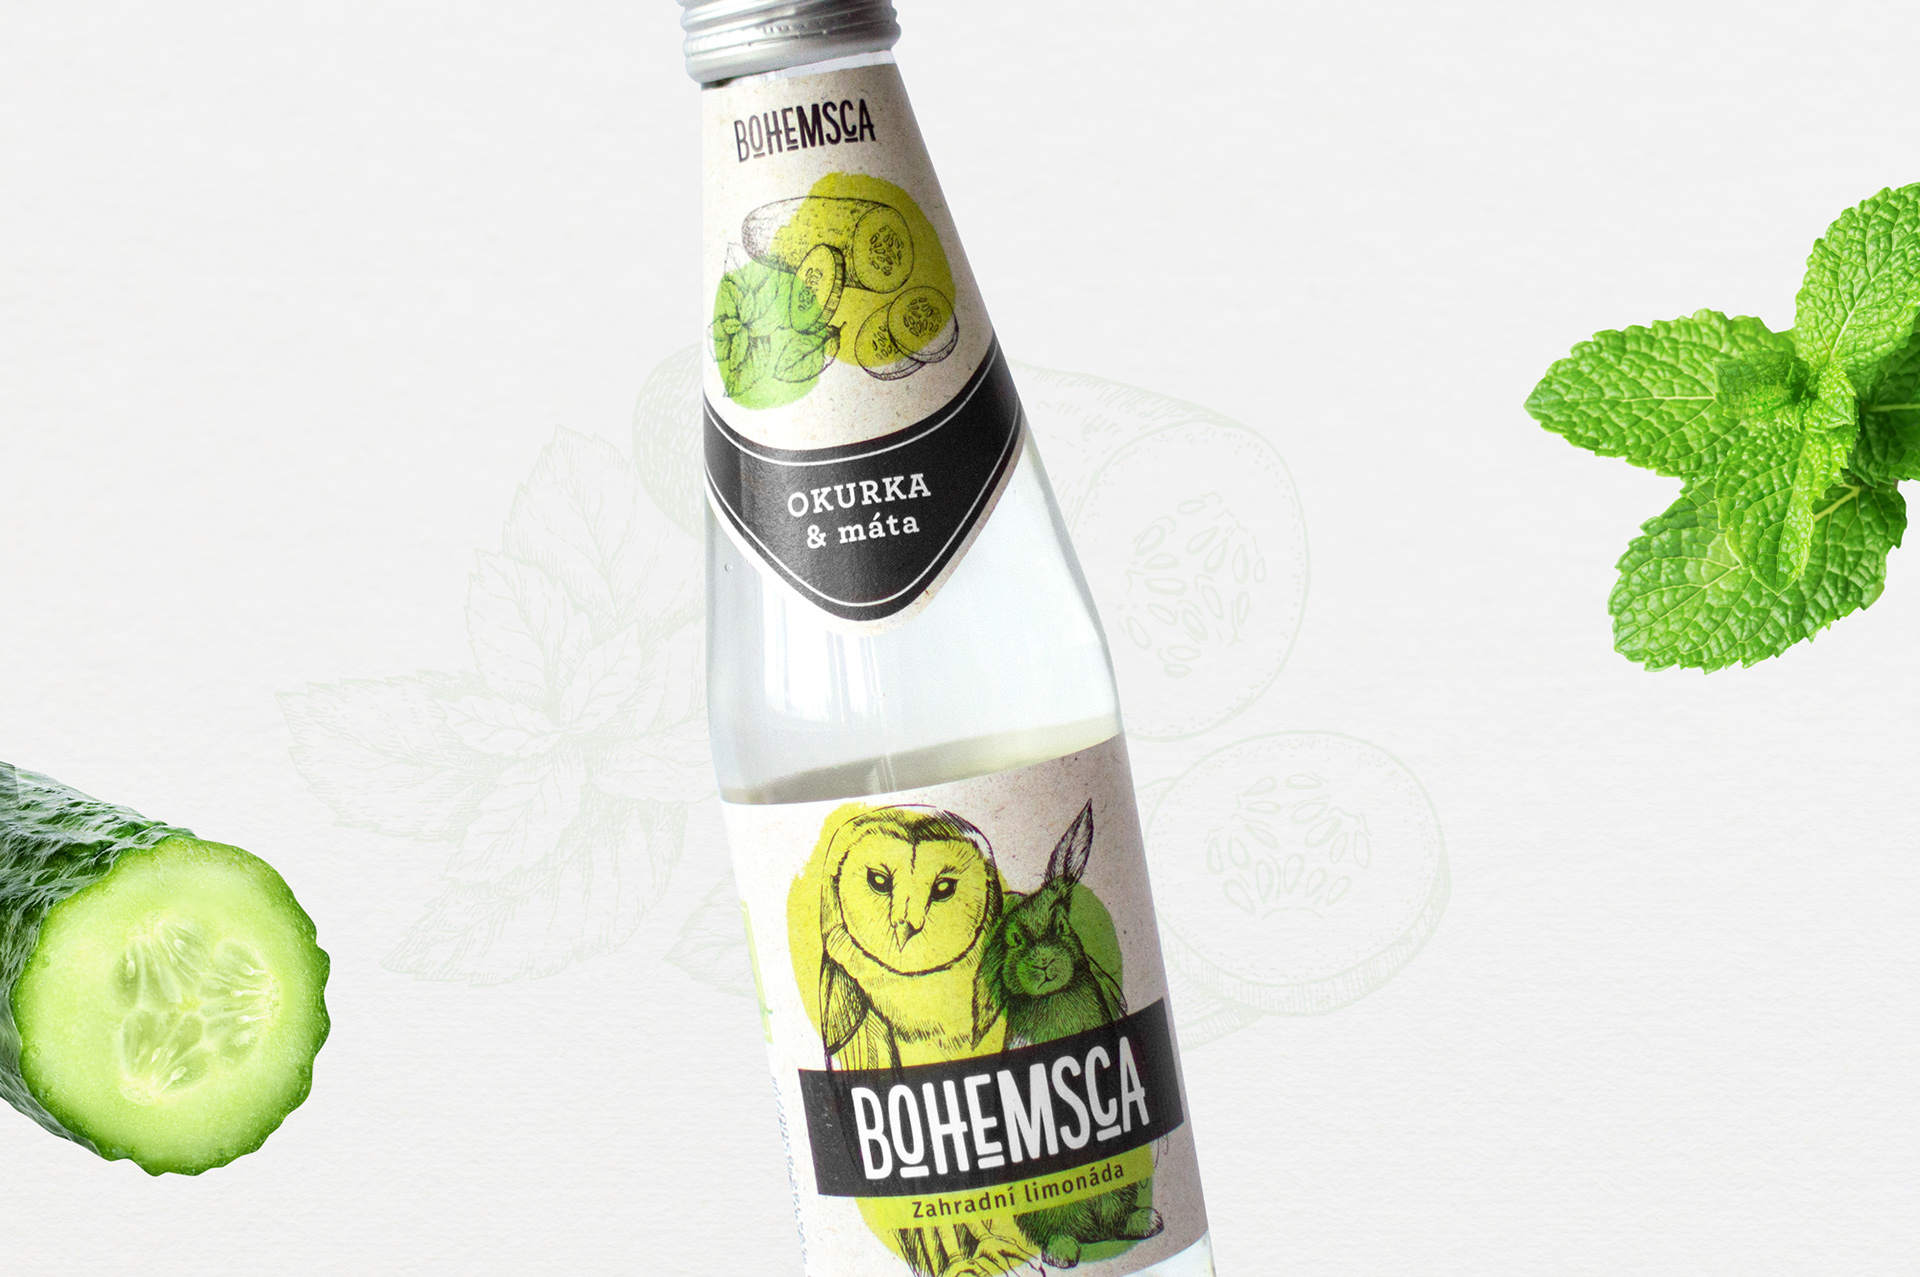 Bohemsca4